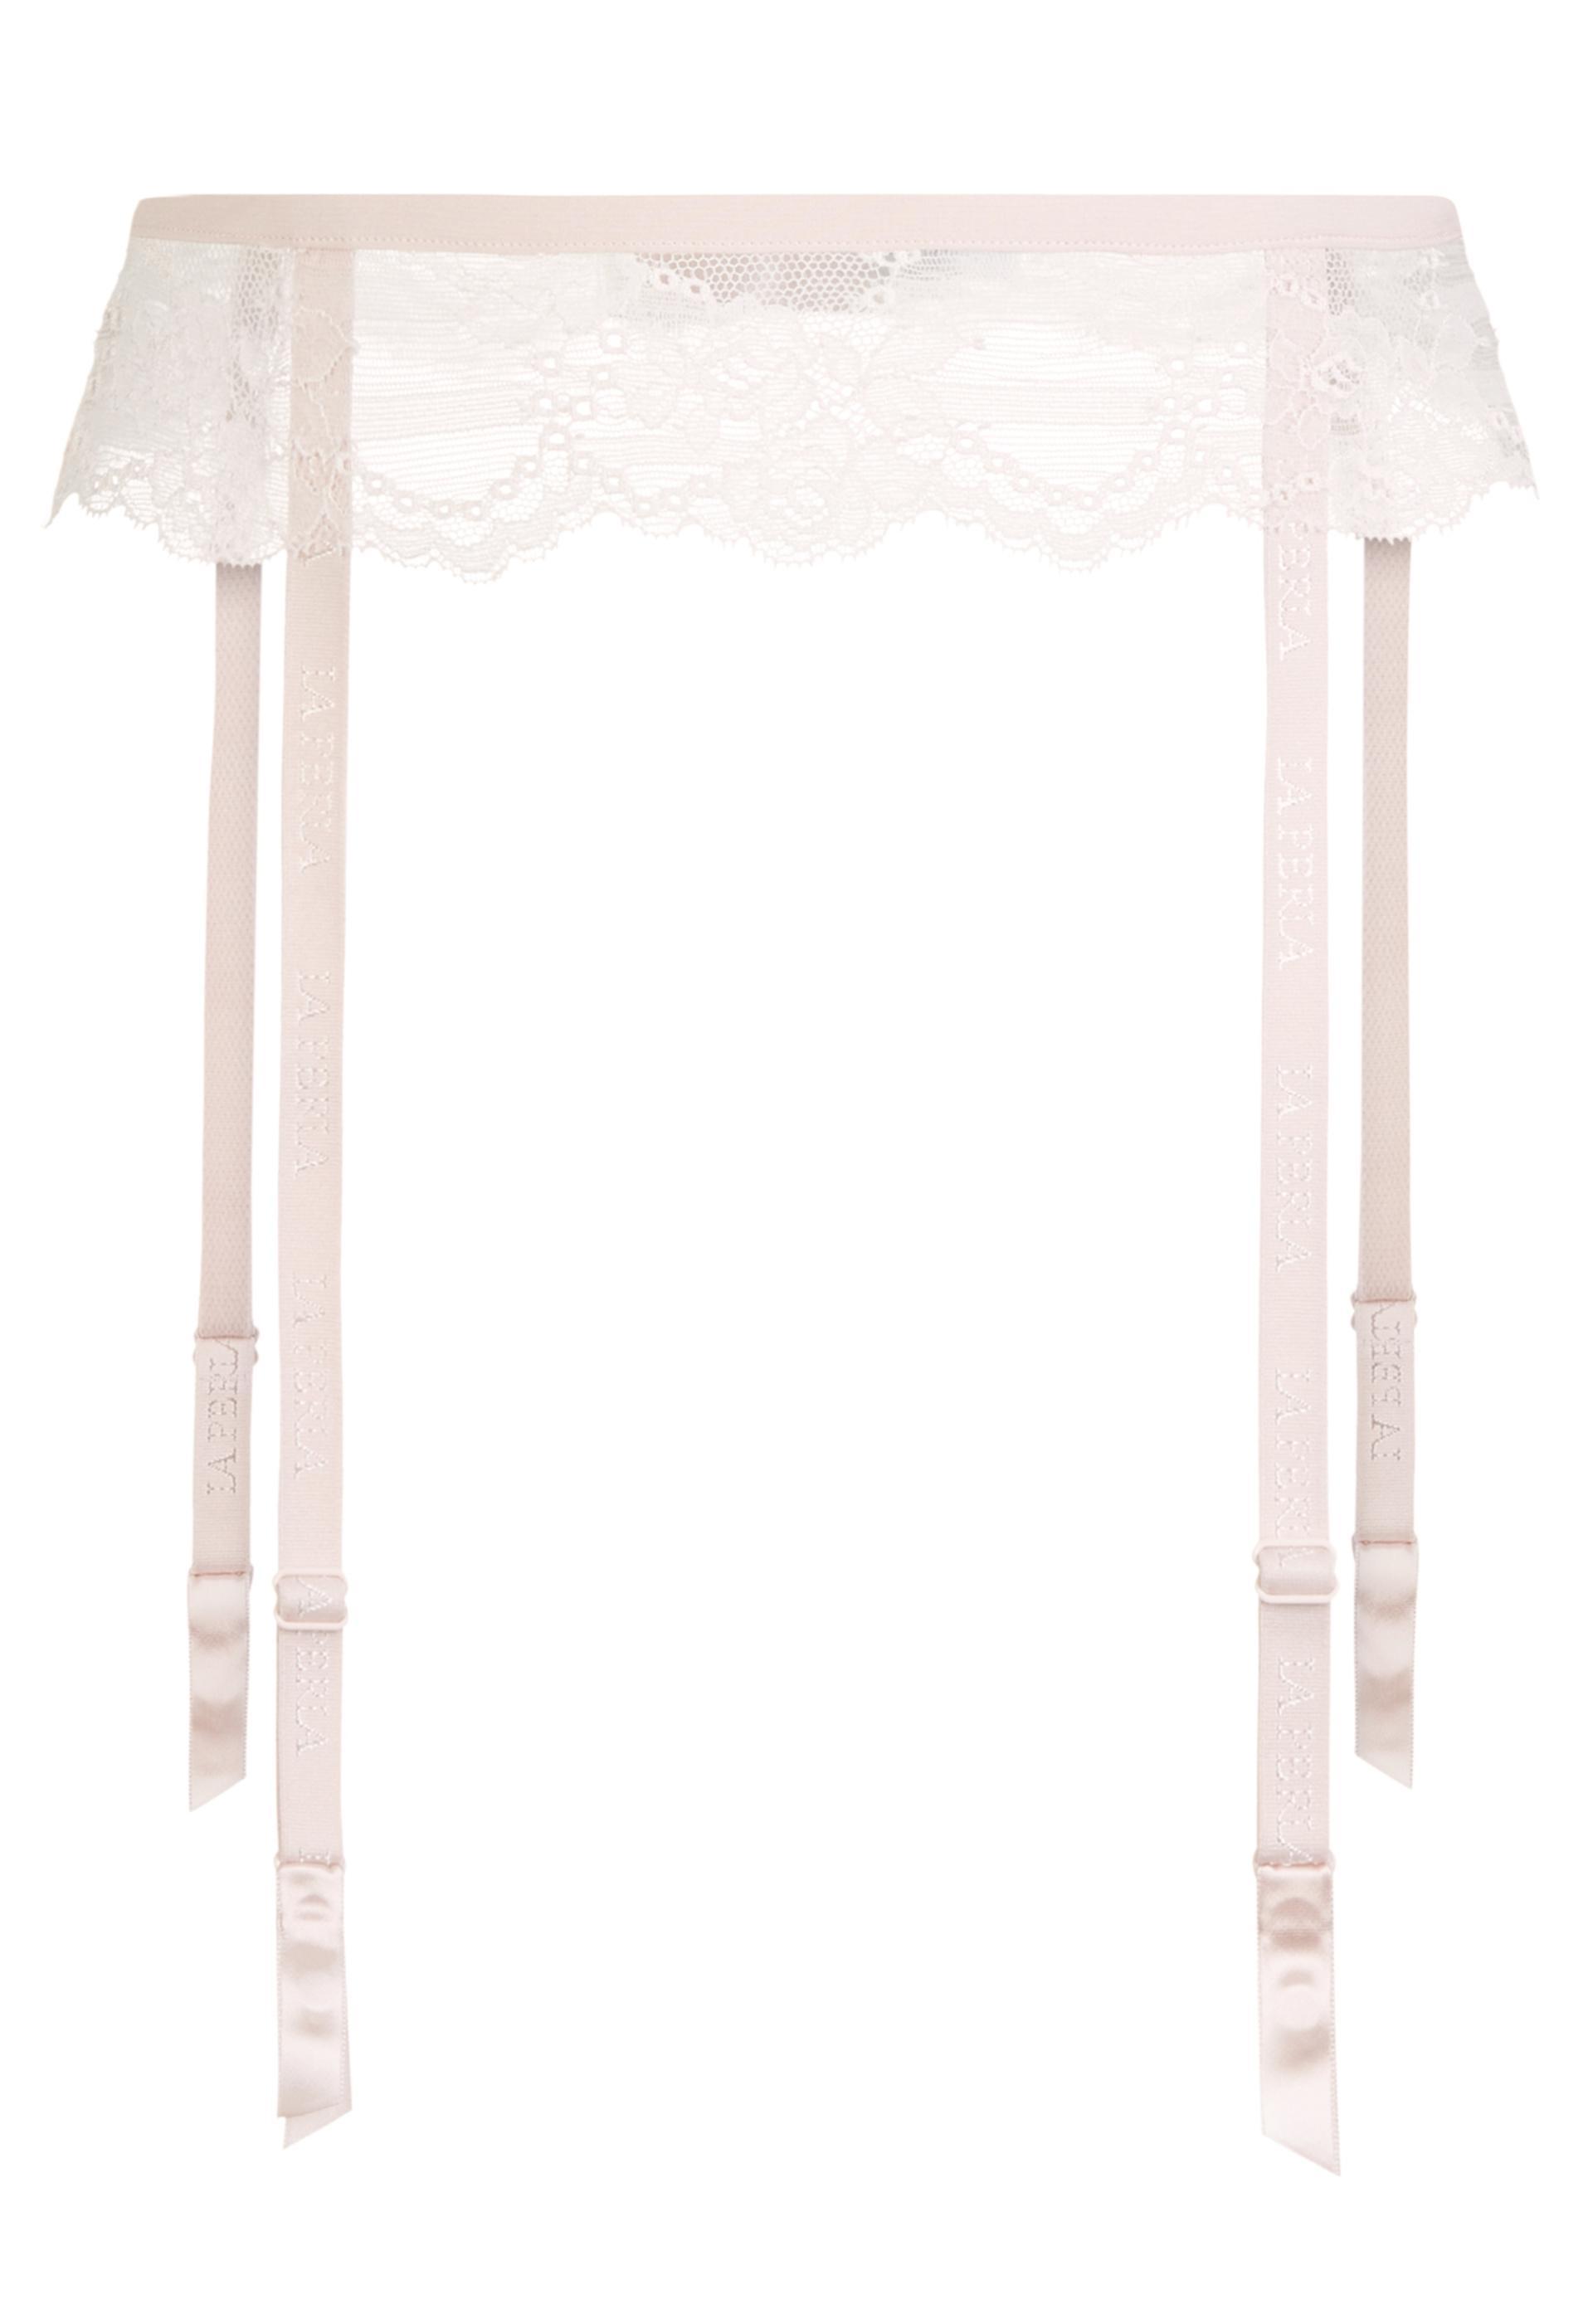 679180db62c Lyst - La Perla Tuberose Blush Pink Leavers Lace Suspender Belt in Pink